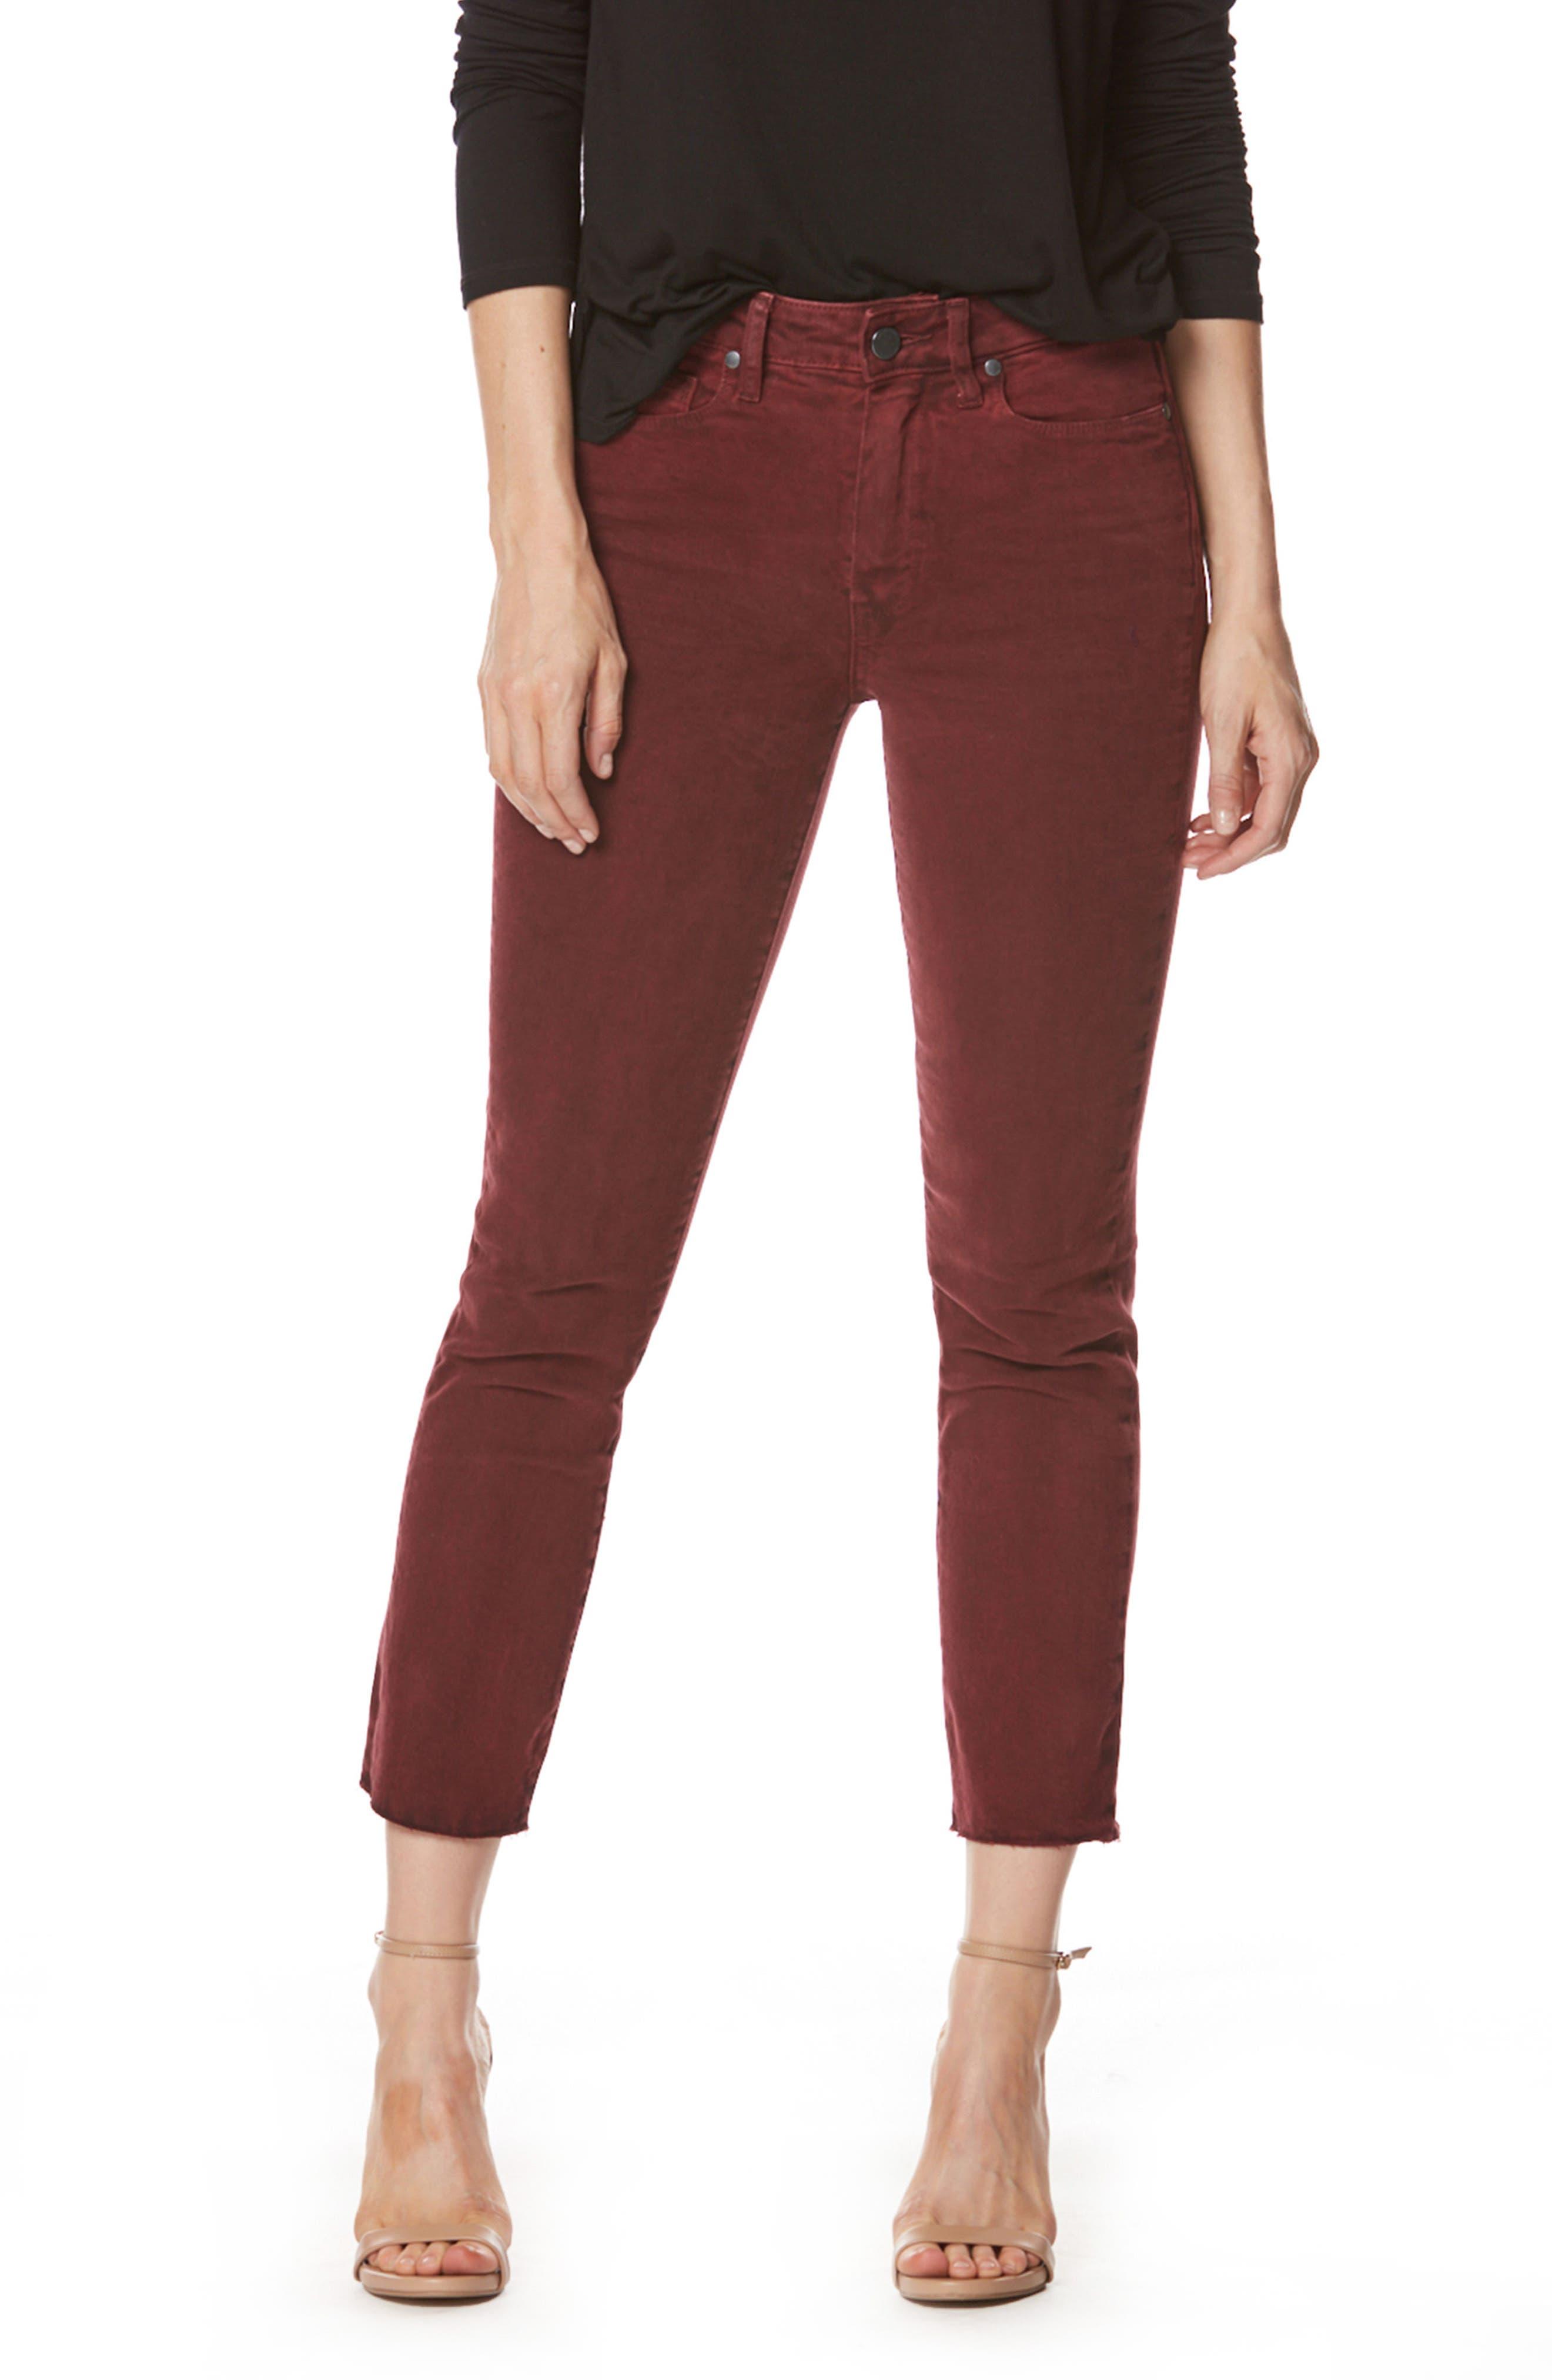 Alternate Image 1 Selected - PAIGE Jacqueline High Waist Crop Straight Leg Jeans